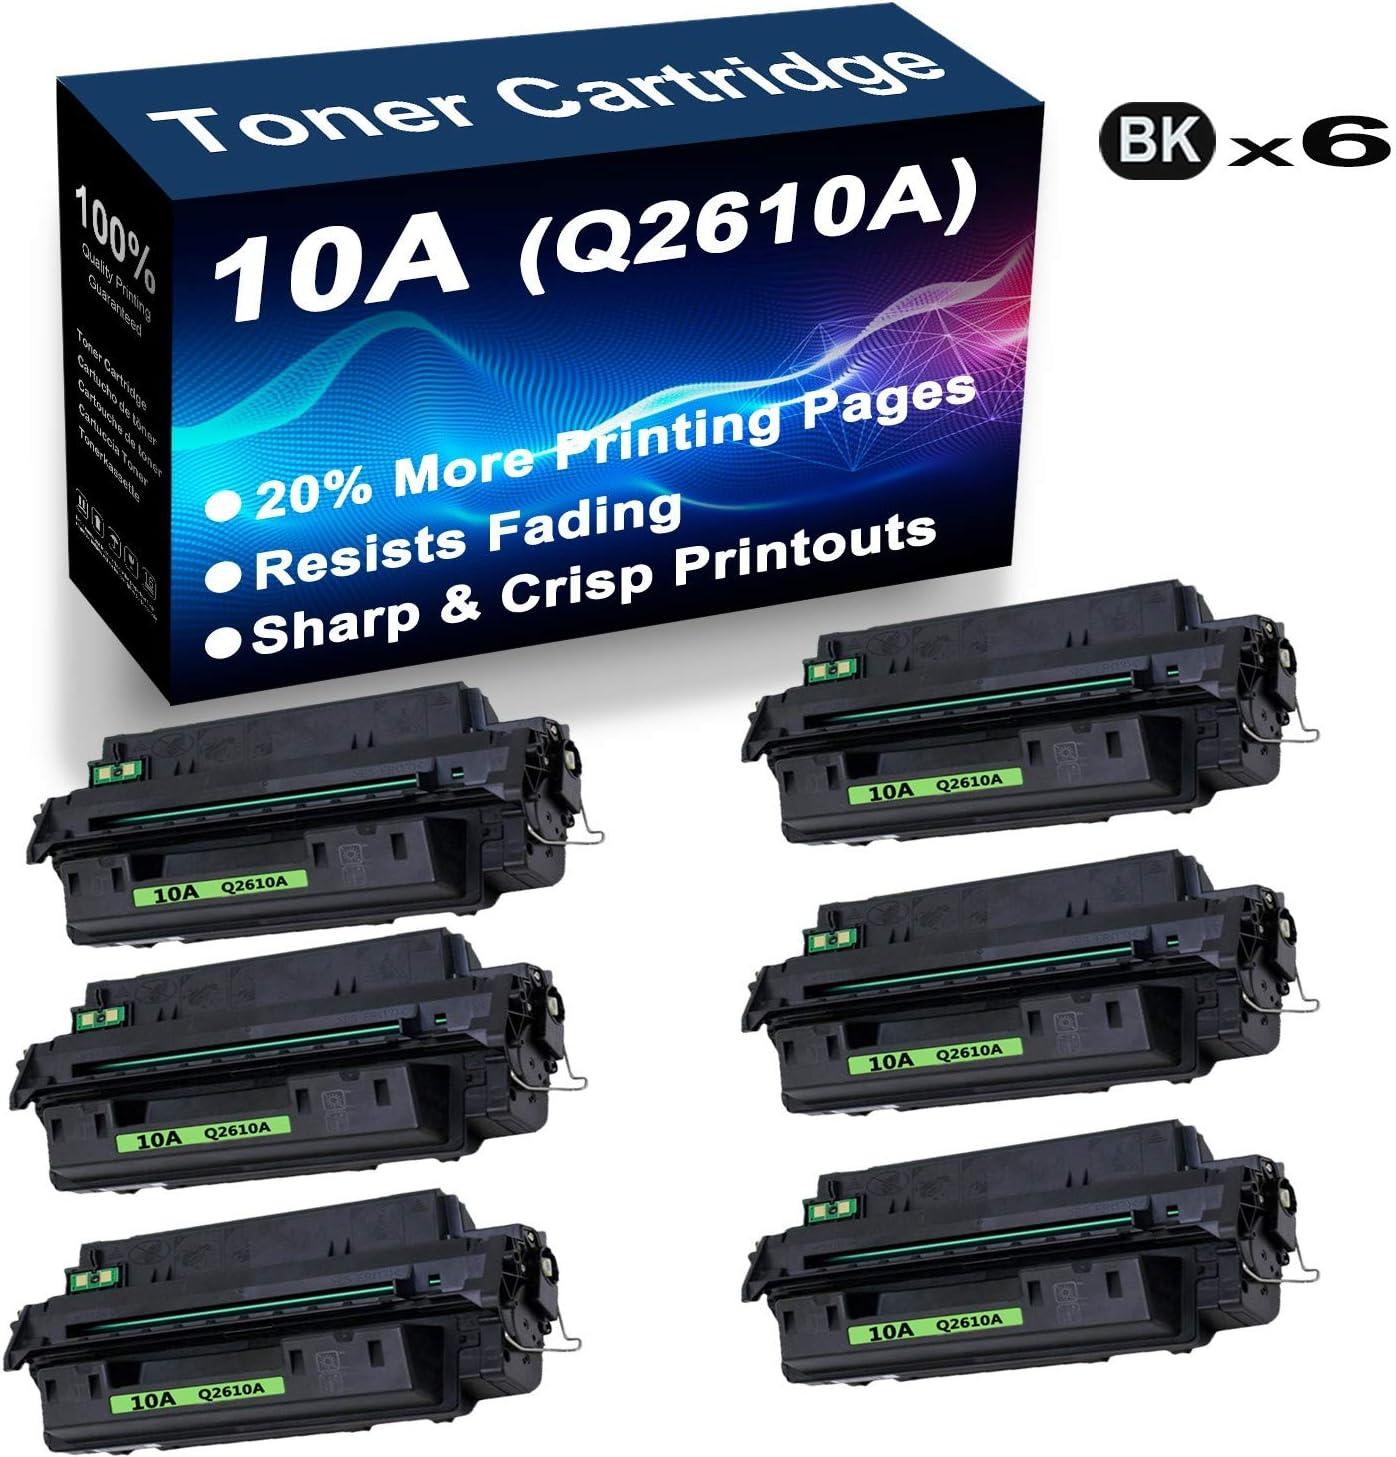 6-Pack (Black) Compatible High Yield 2300. Printer Toner Cartridge for HP Laserjet 2300 Printer